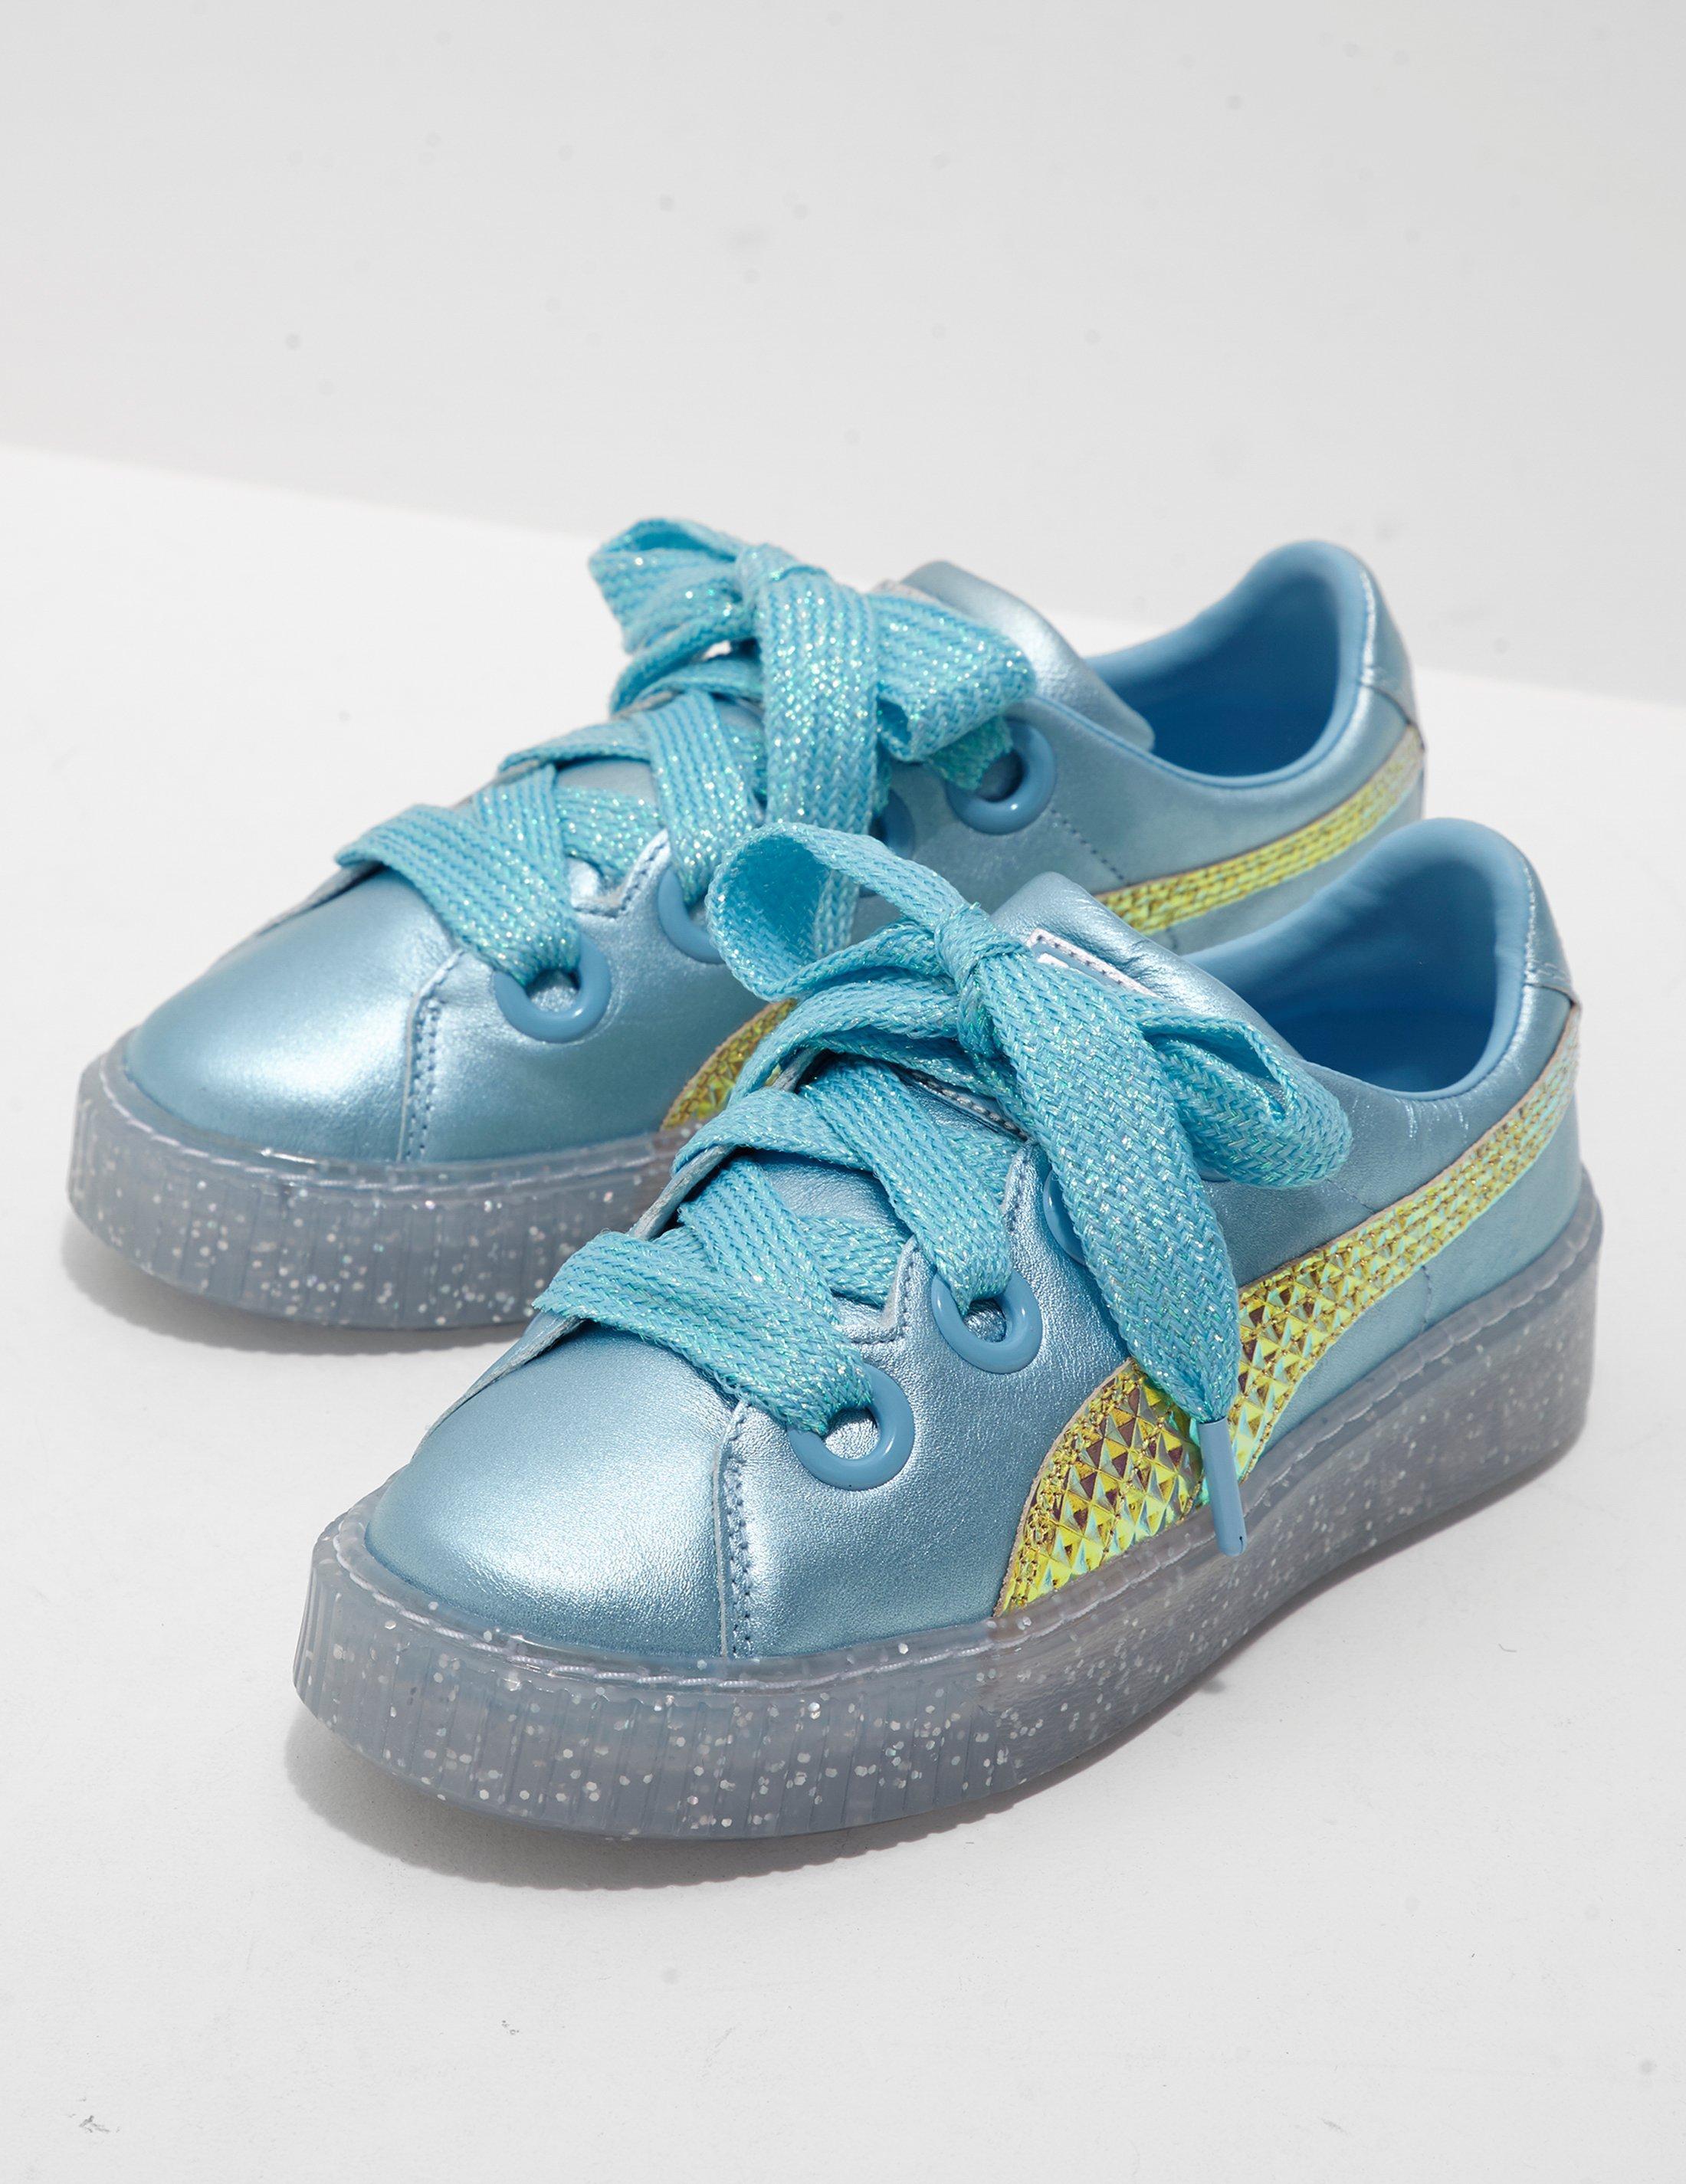 87a438ce8ca60b Lyst - PUMA X Sophia Webster Glitter Princess Trainers Blue in Blue ...